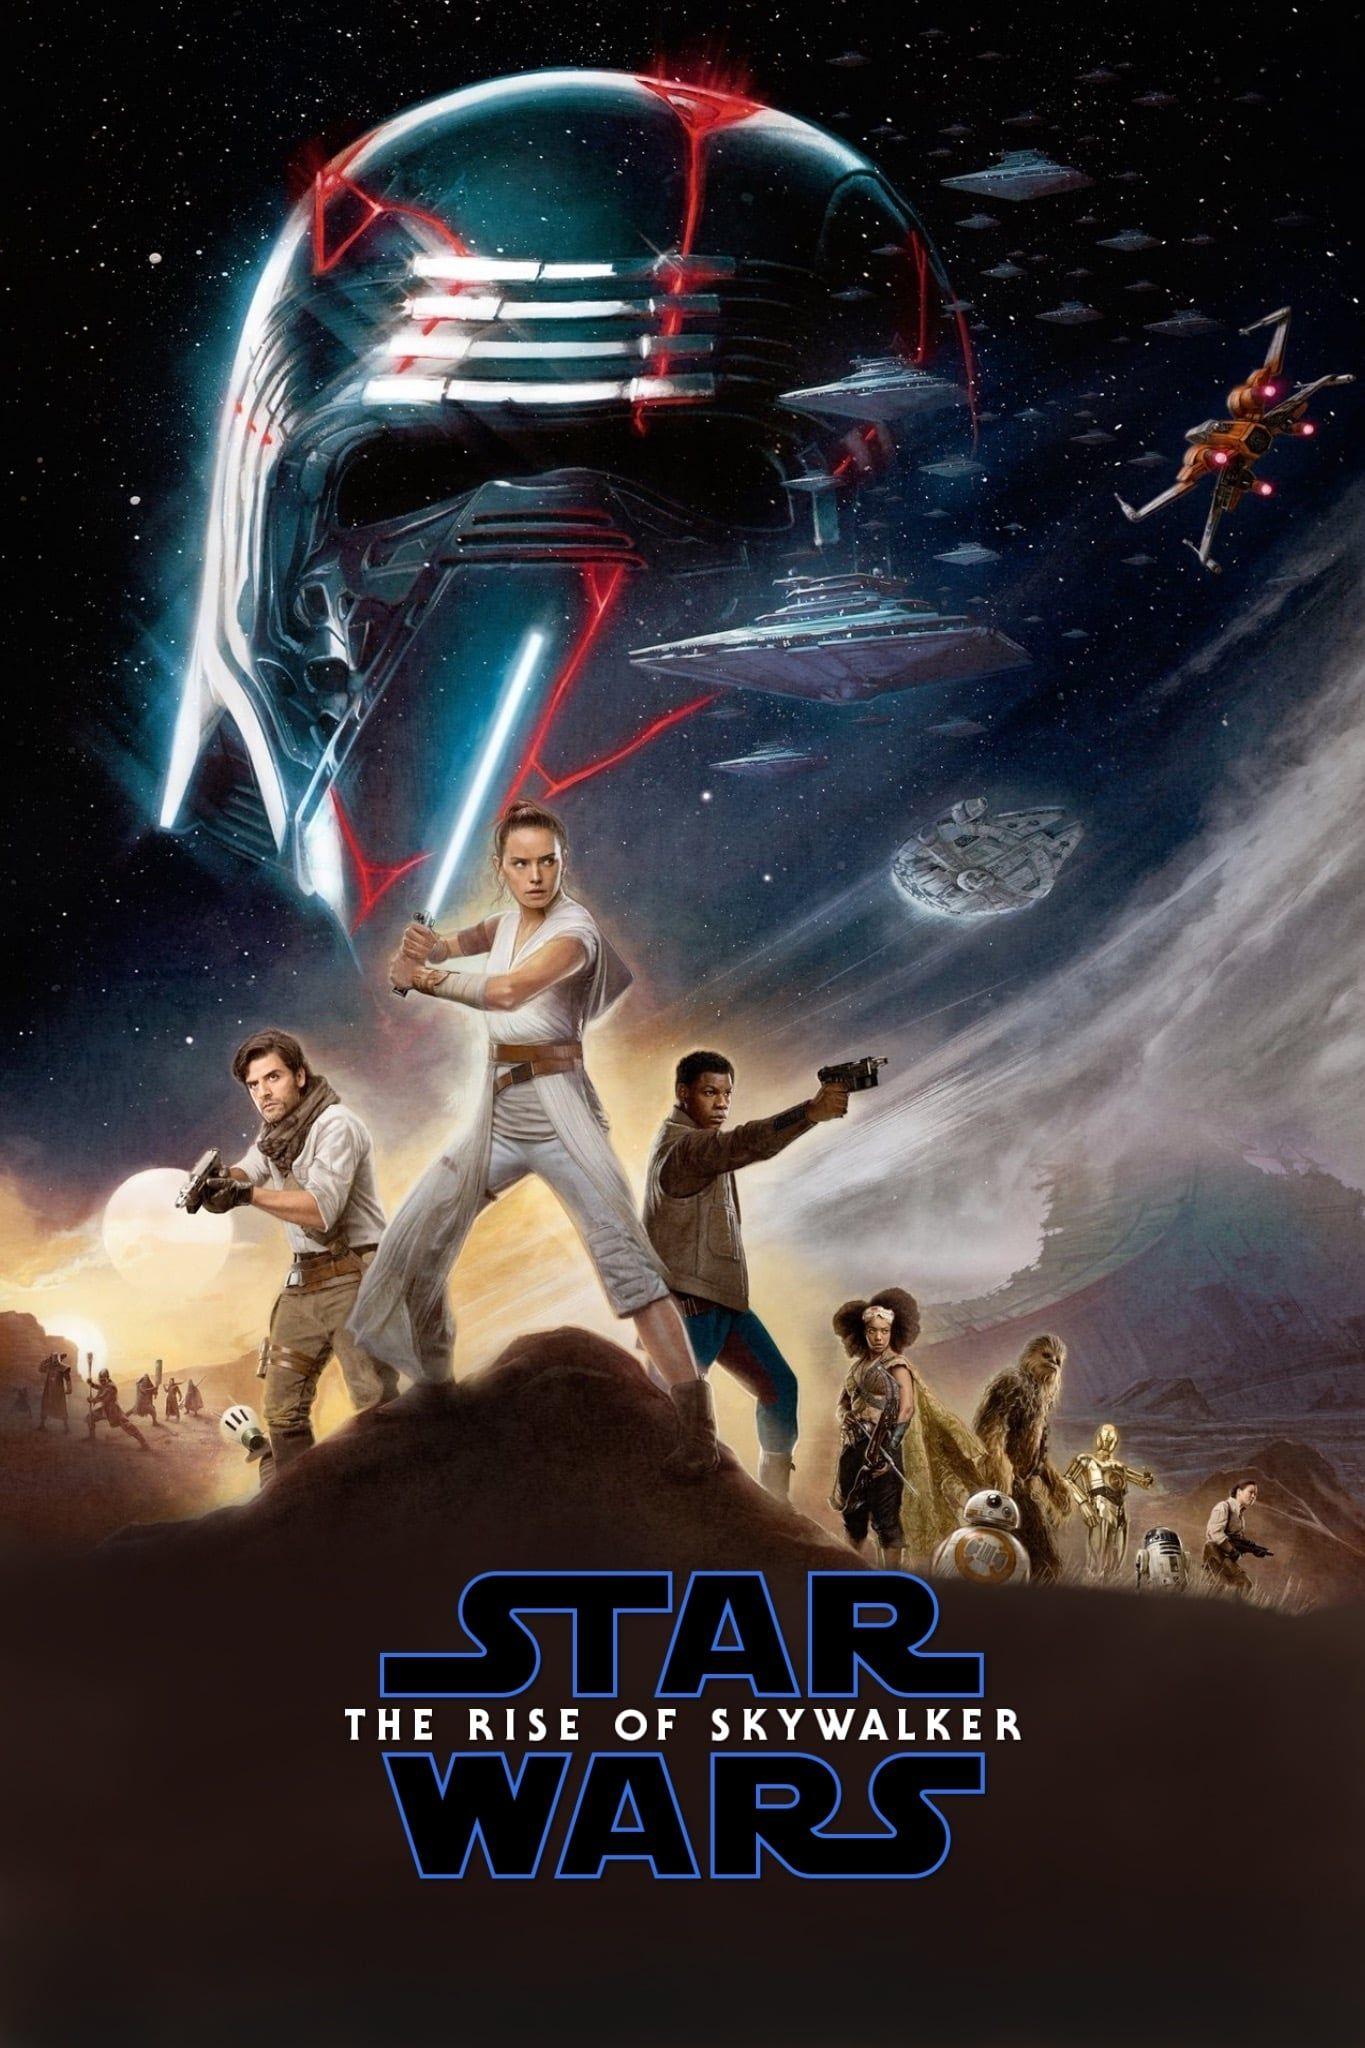 Star Wars The Rise Of Skywalker 2019 Google Drive Movie Hd 1080p Star Wars Episodes Star Wars Watch Star Wars Poster